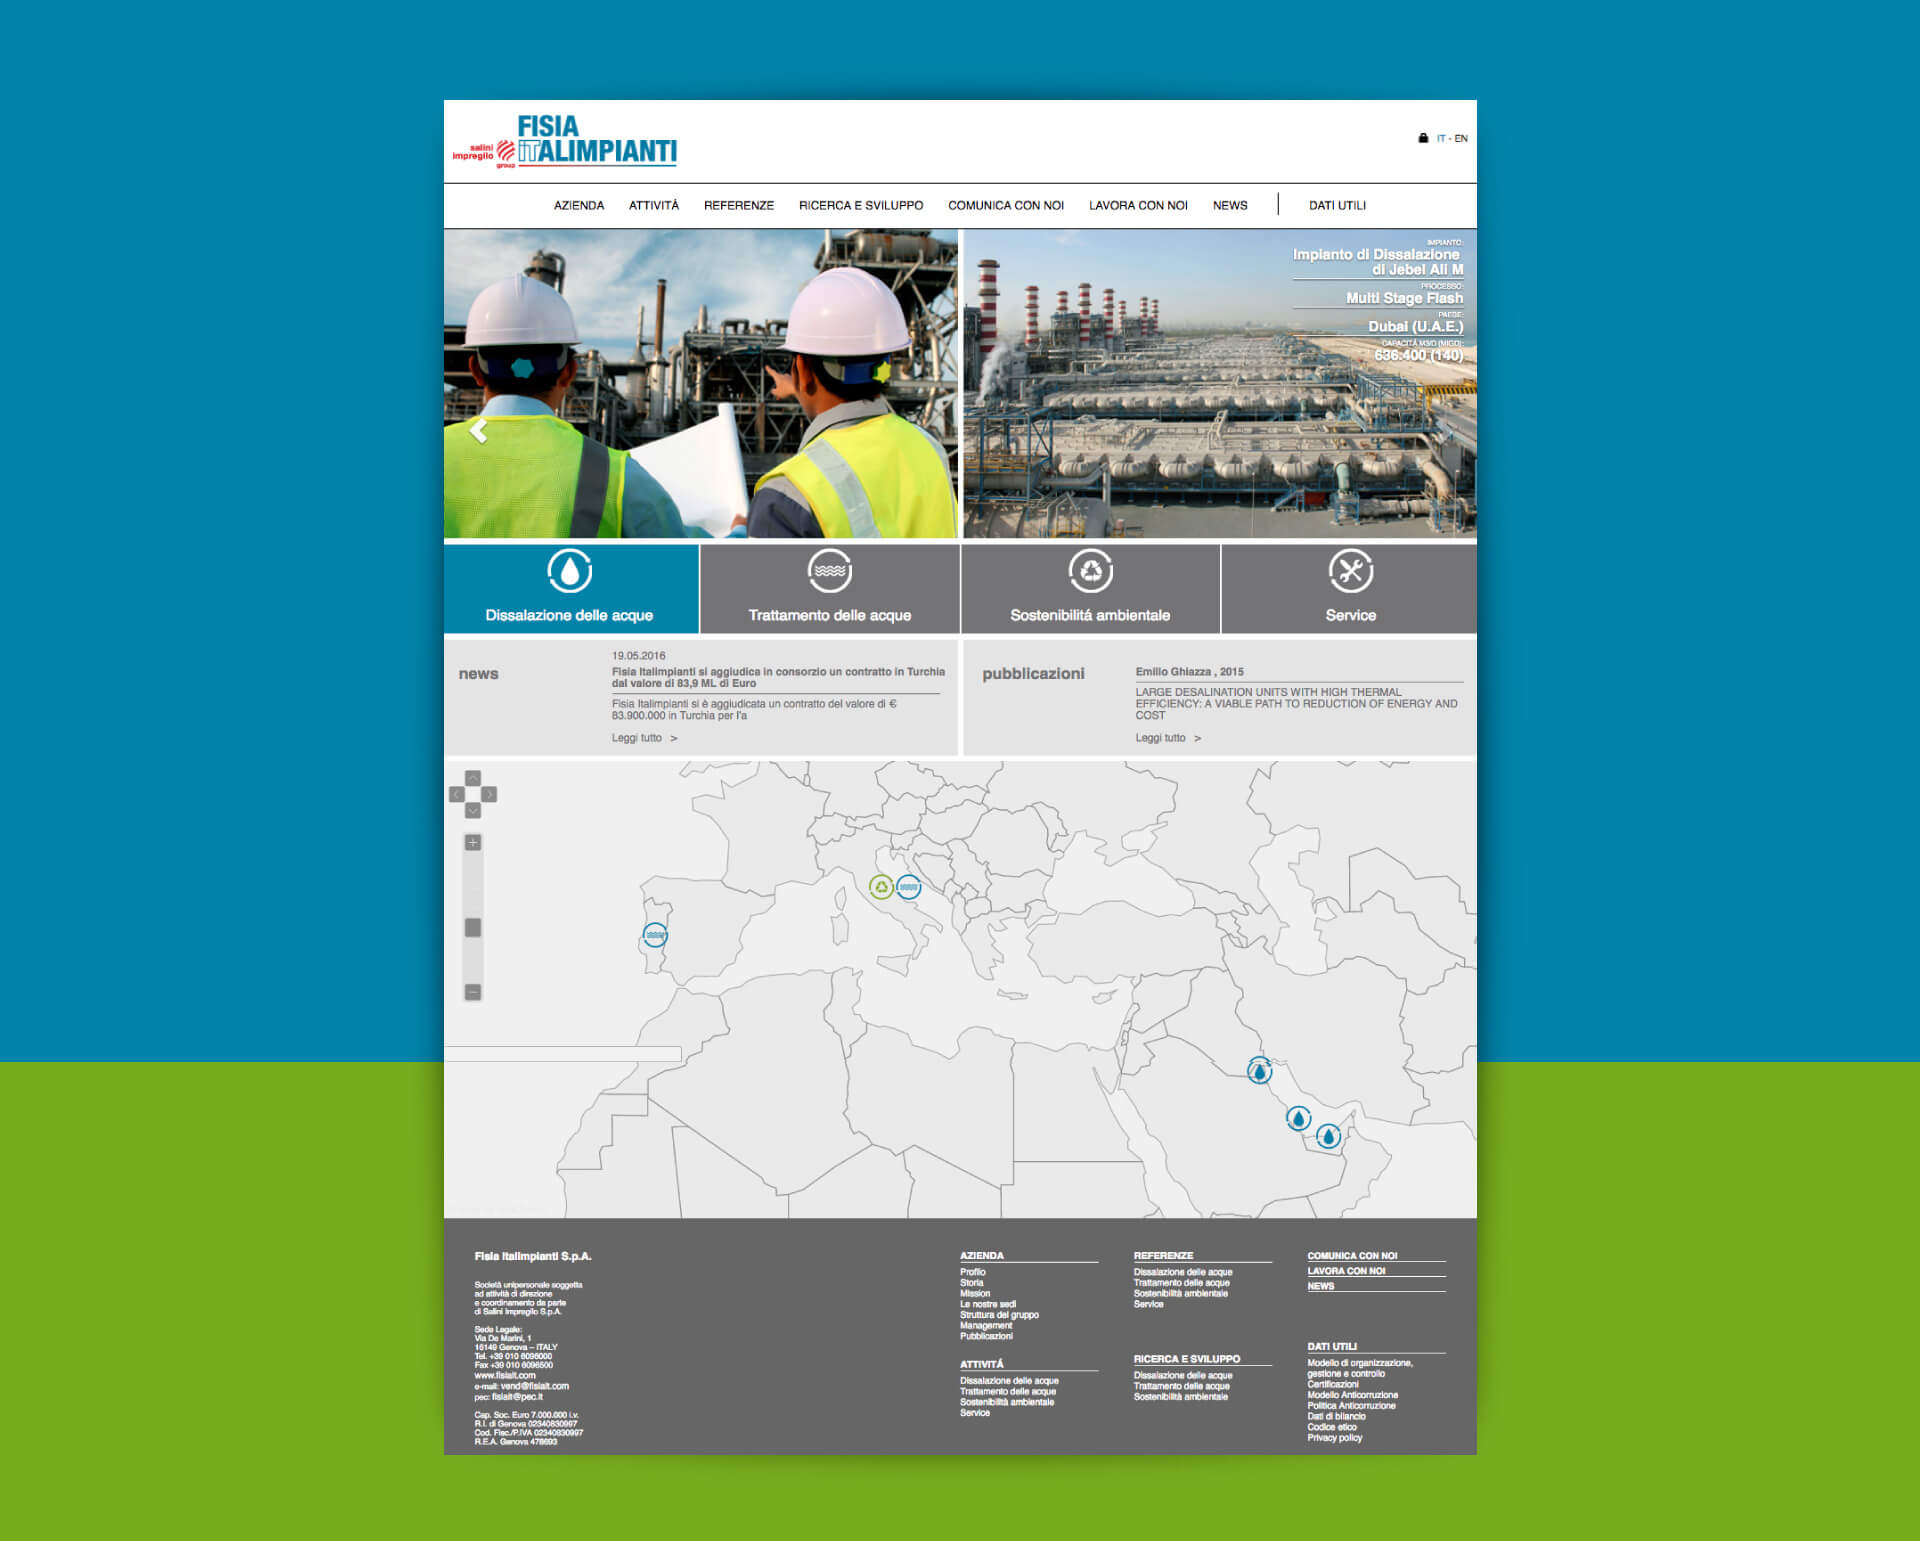 mintlab-webdesign-fisia-italimpianti-02